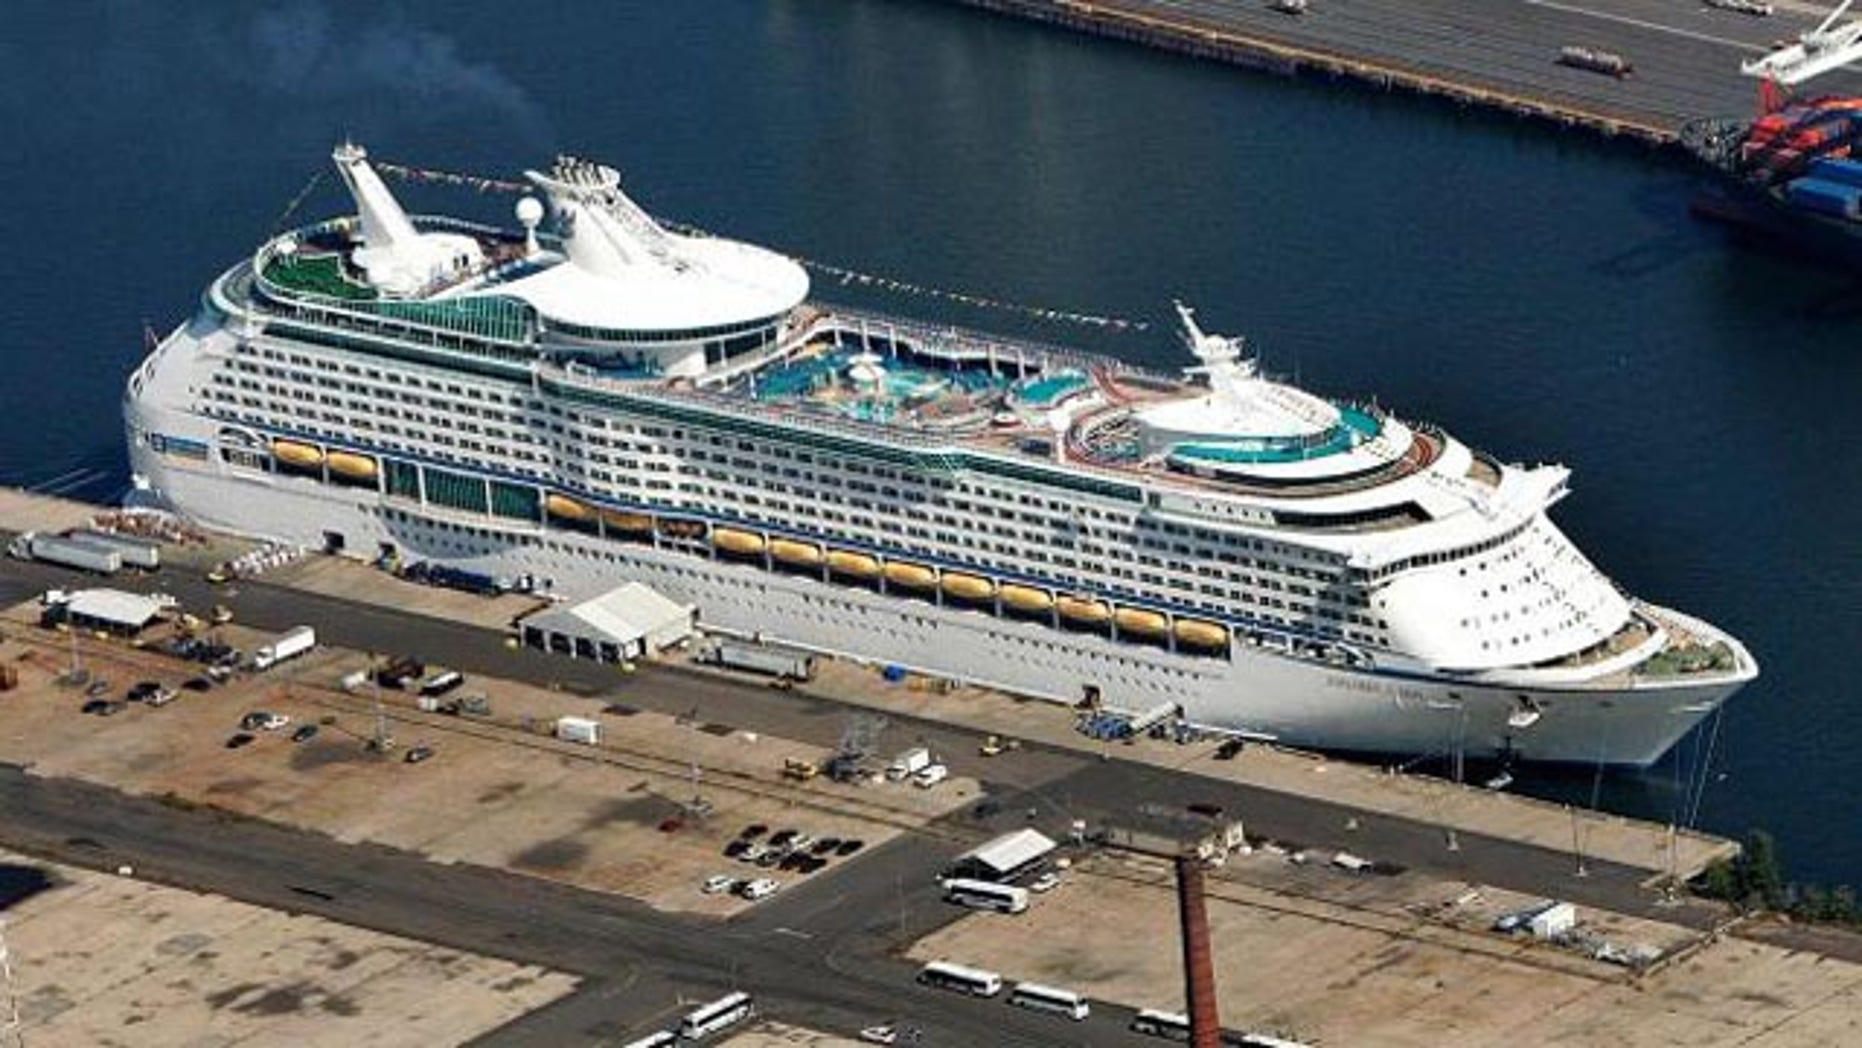 More than 300 people fall ill aboard cruise ship | Fox News